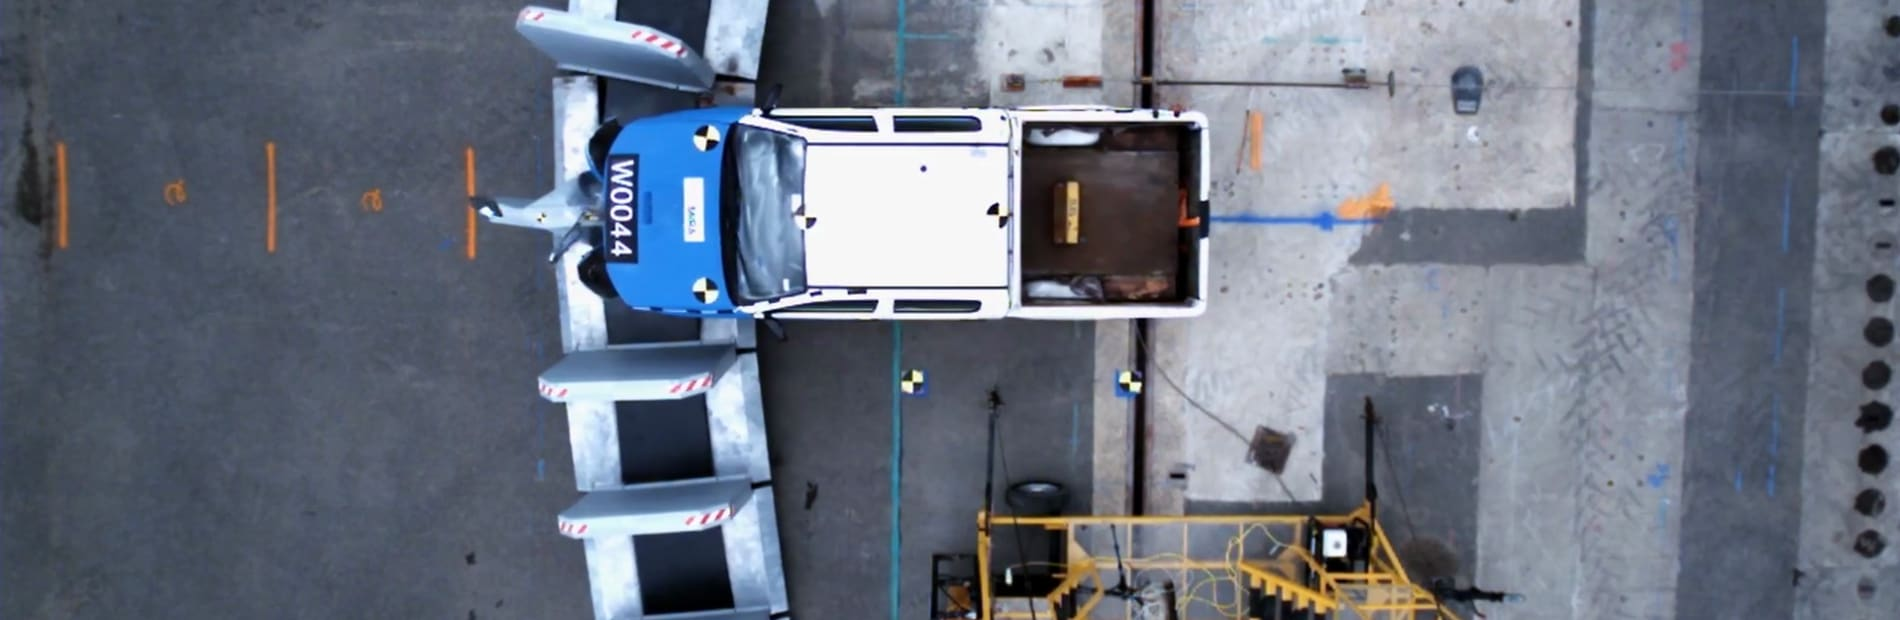 RhinoGuard® Steel GateKeeper™ being tested to IWA 14.1 standard